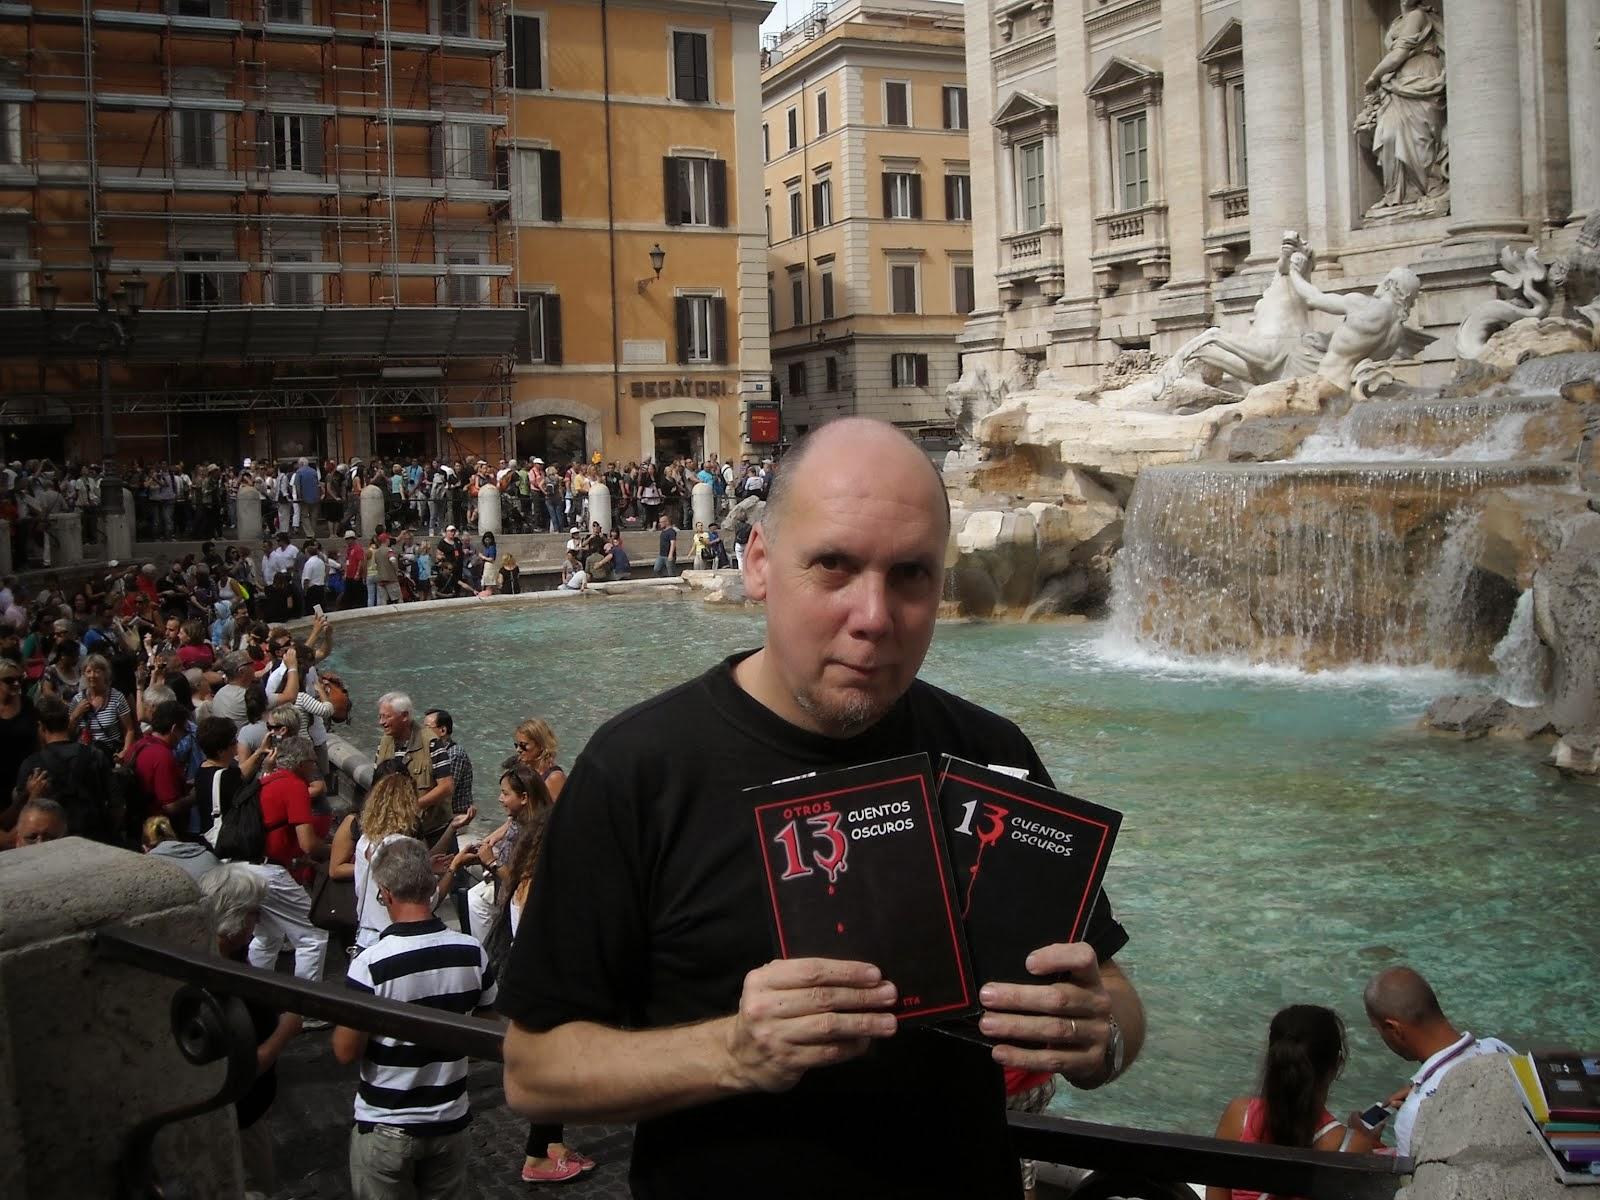 cuentos oscuros en la Fontana di Trevi